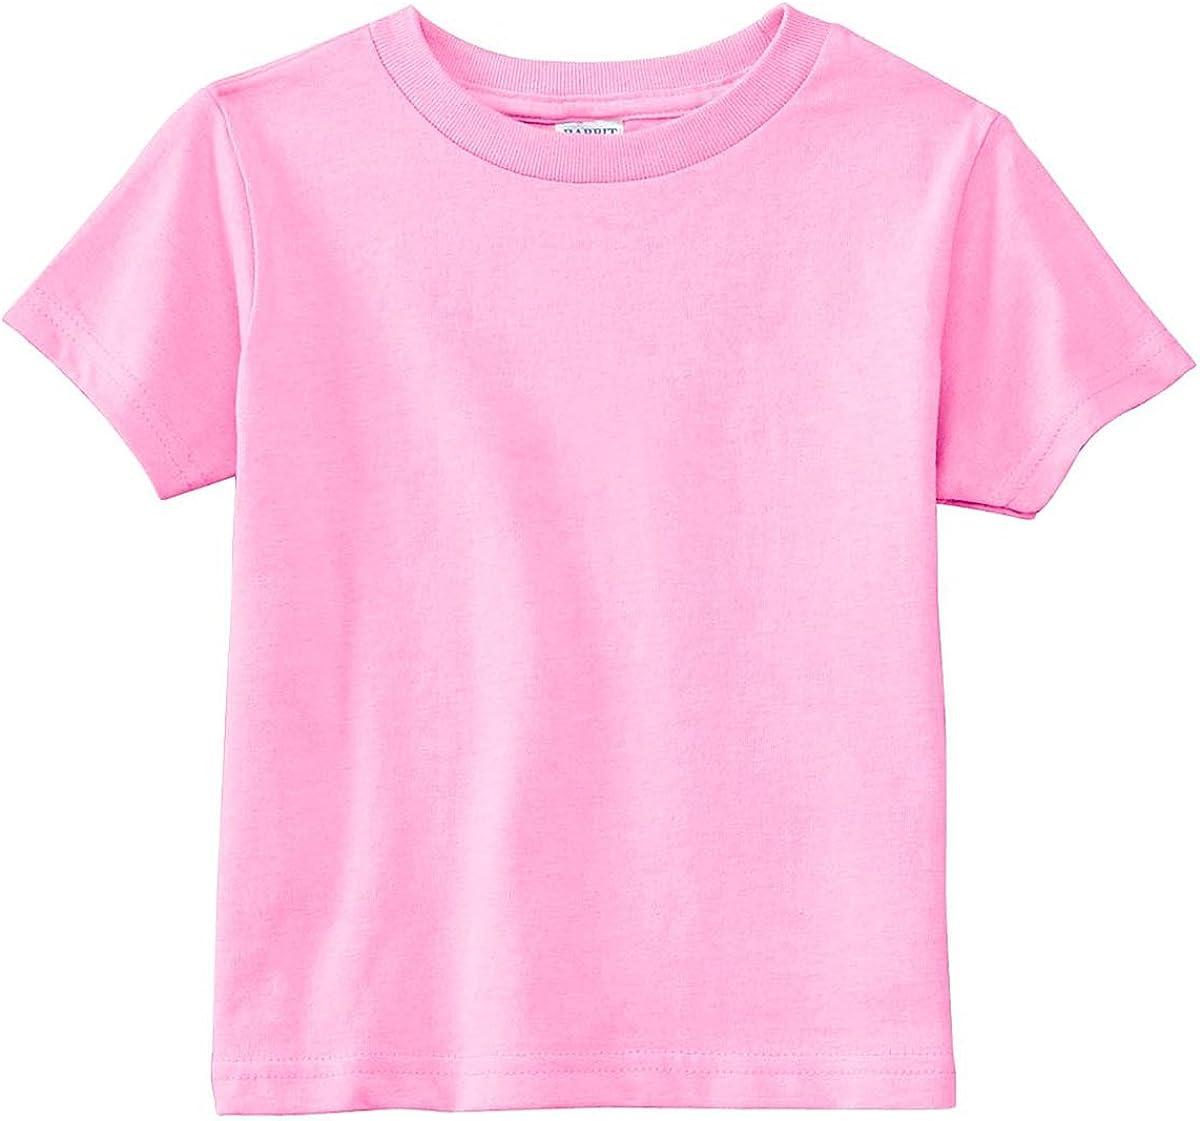 Rabbit Skins Infant Needle Sleeve Bottom Cotton Ribbed Crewneck T-Shirt 3301J